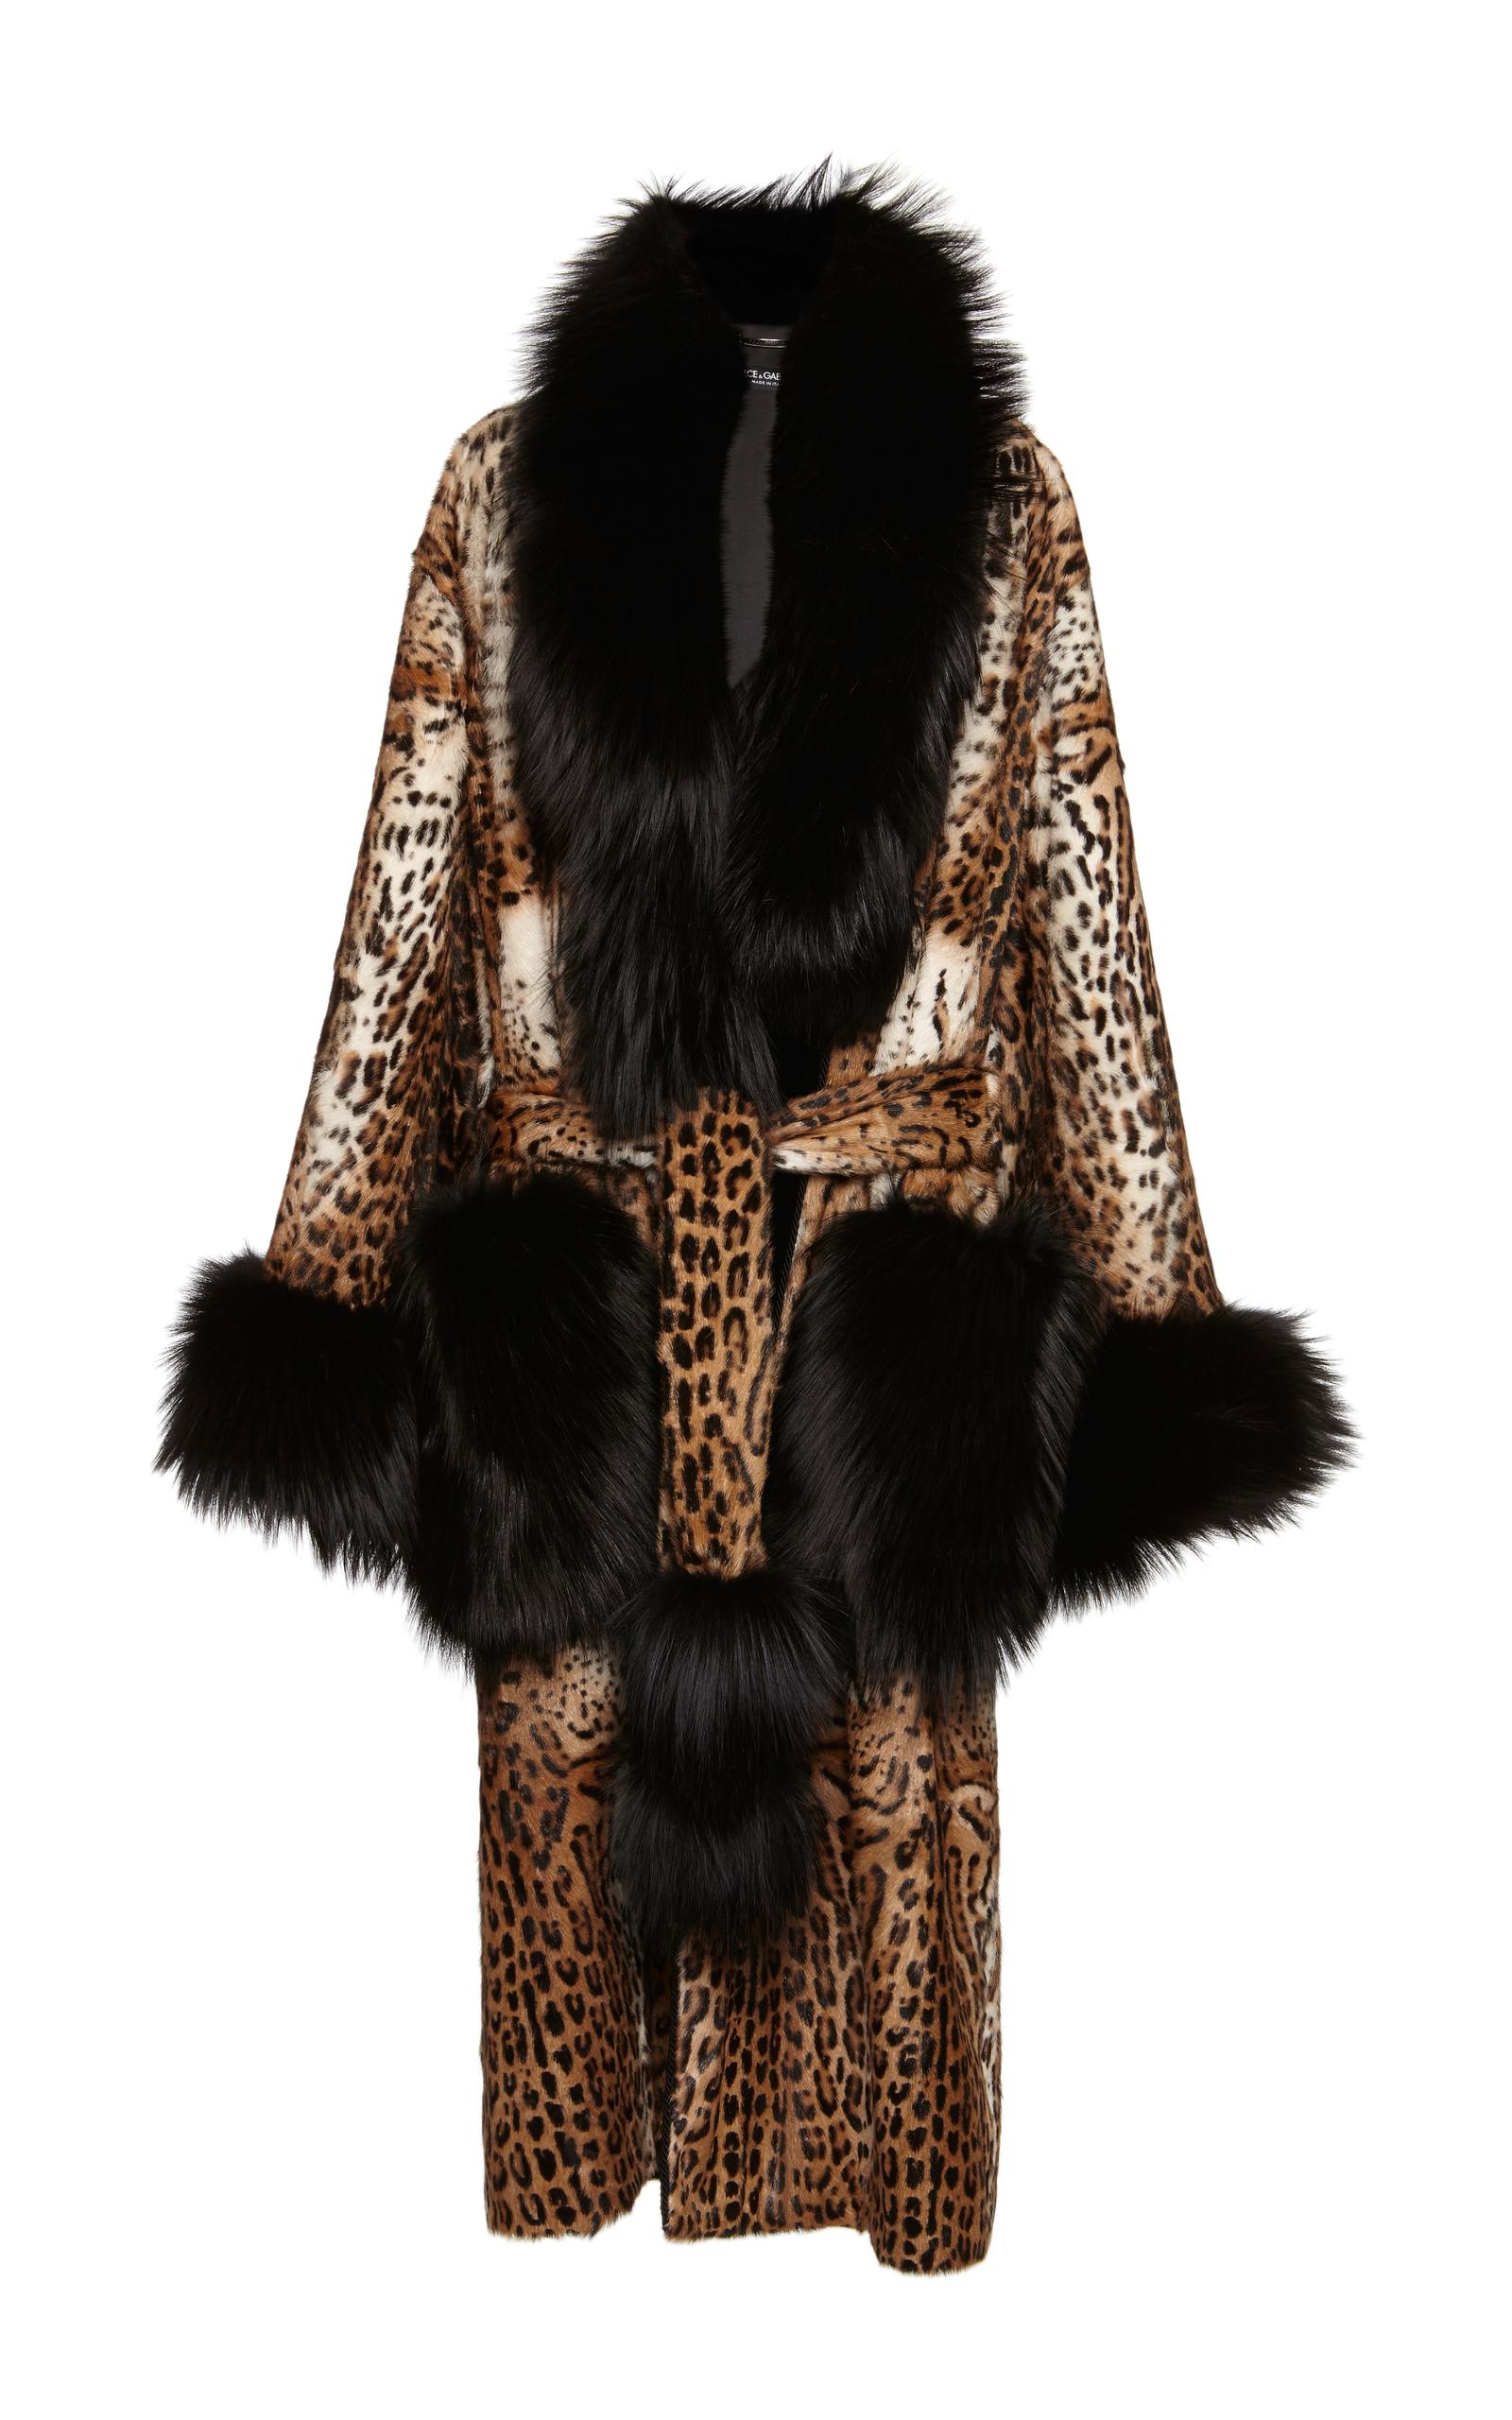 ab2b349dd693 Leopard Print Fur Coat by Dolce & Gabbana | Moda Operandi